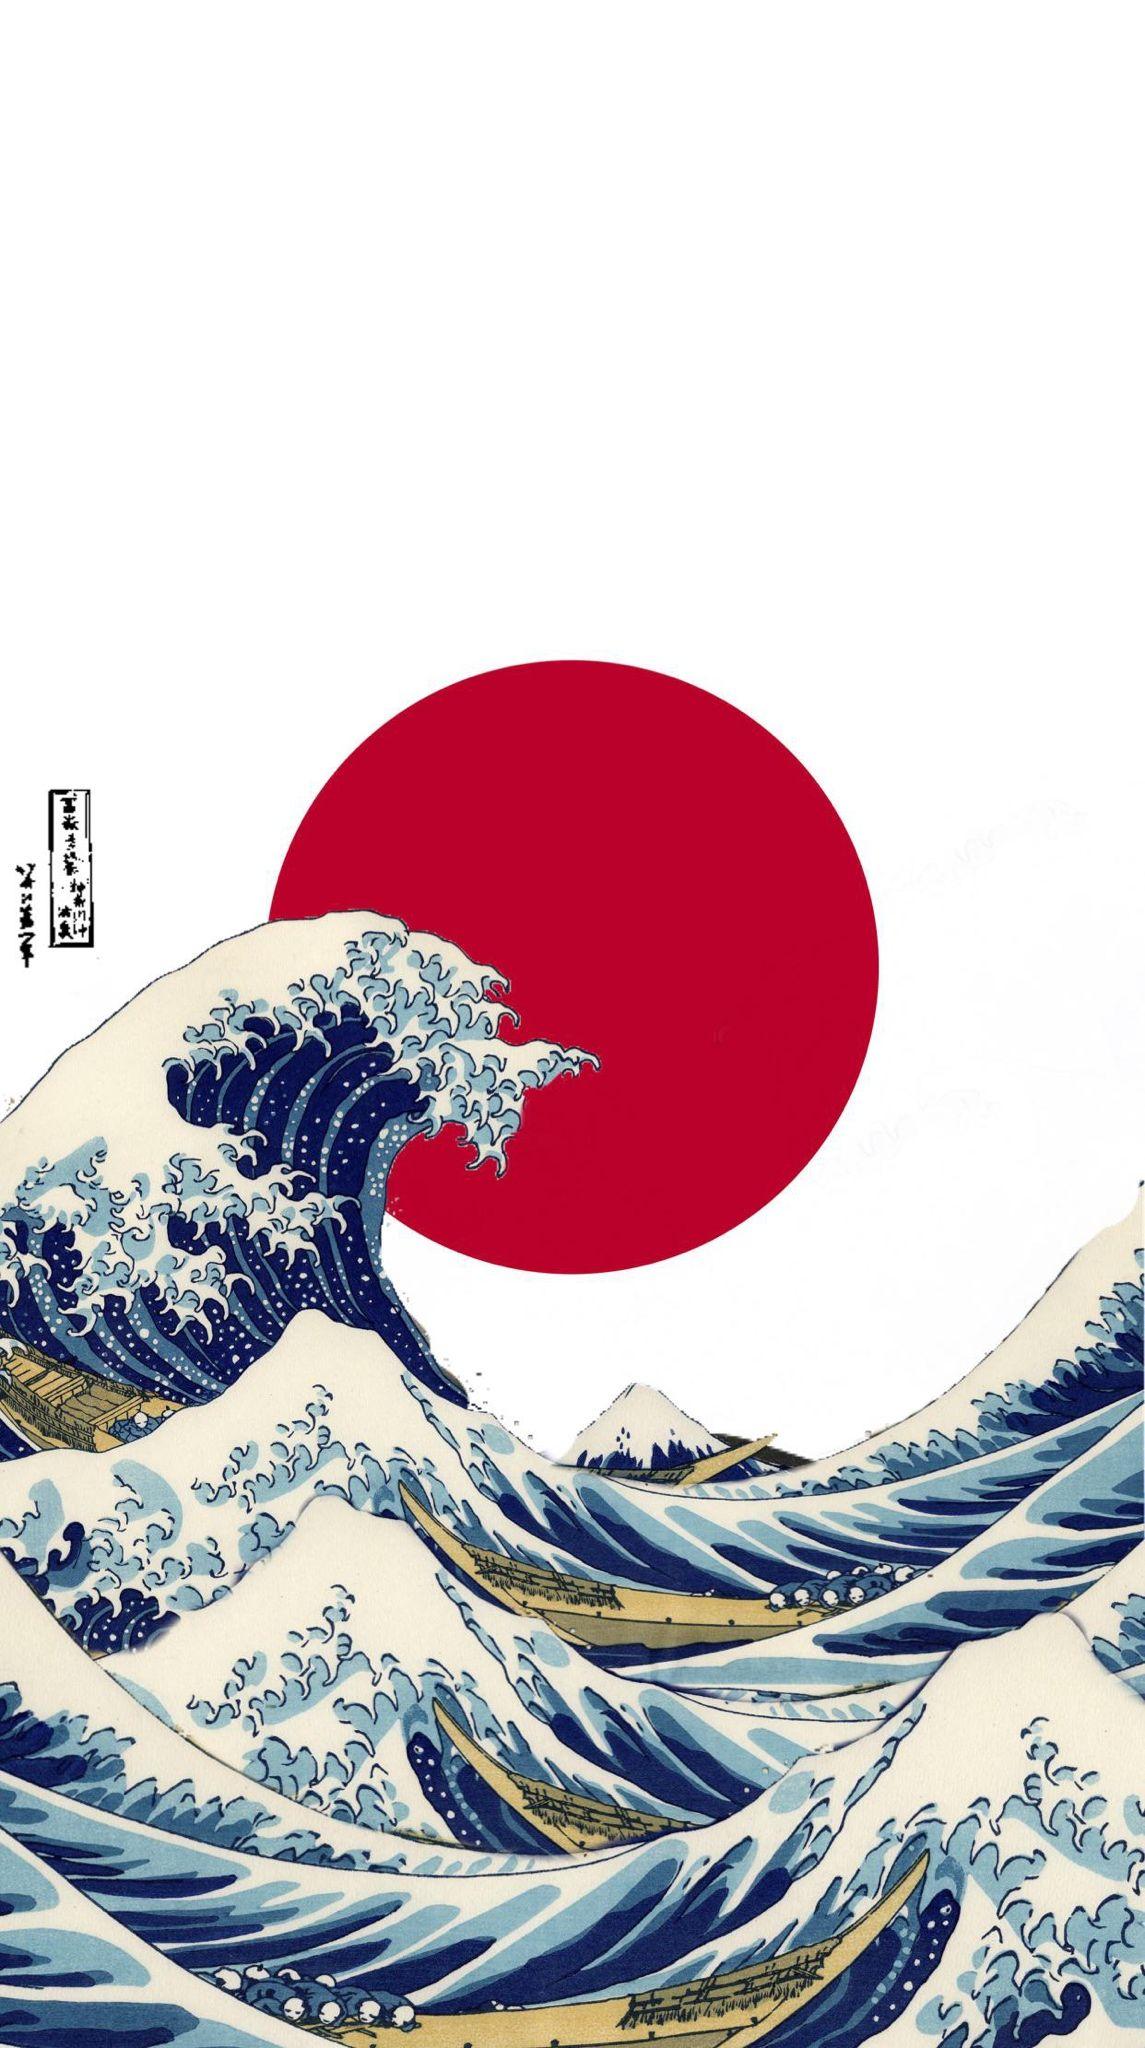 Top Collection Phone And Desktop Wallpaper Hd Estampas Japonesas Gravuras Japonesas Wallpapers Bonitos